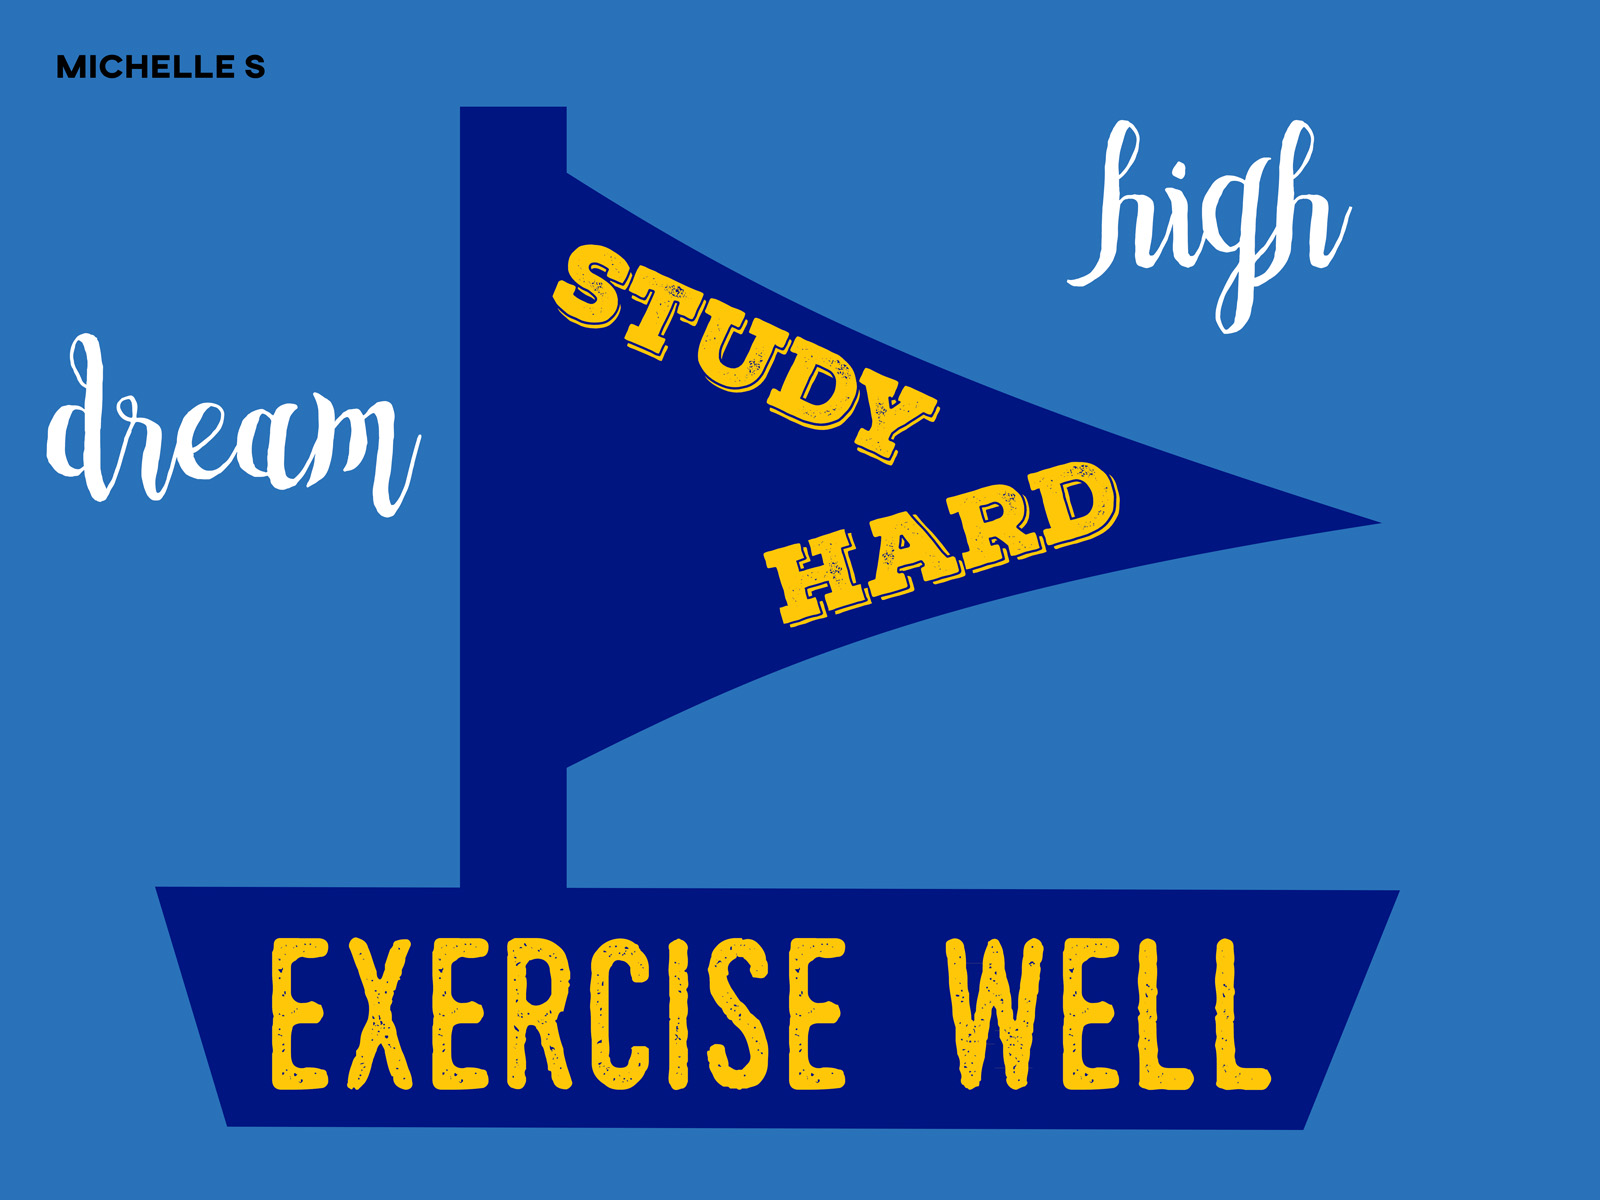 Study hard, exercise well, dream high.